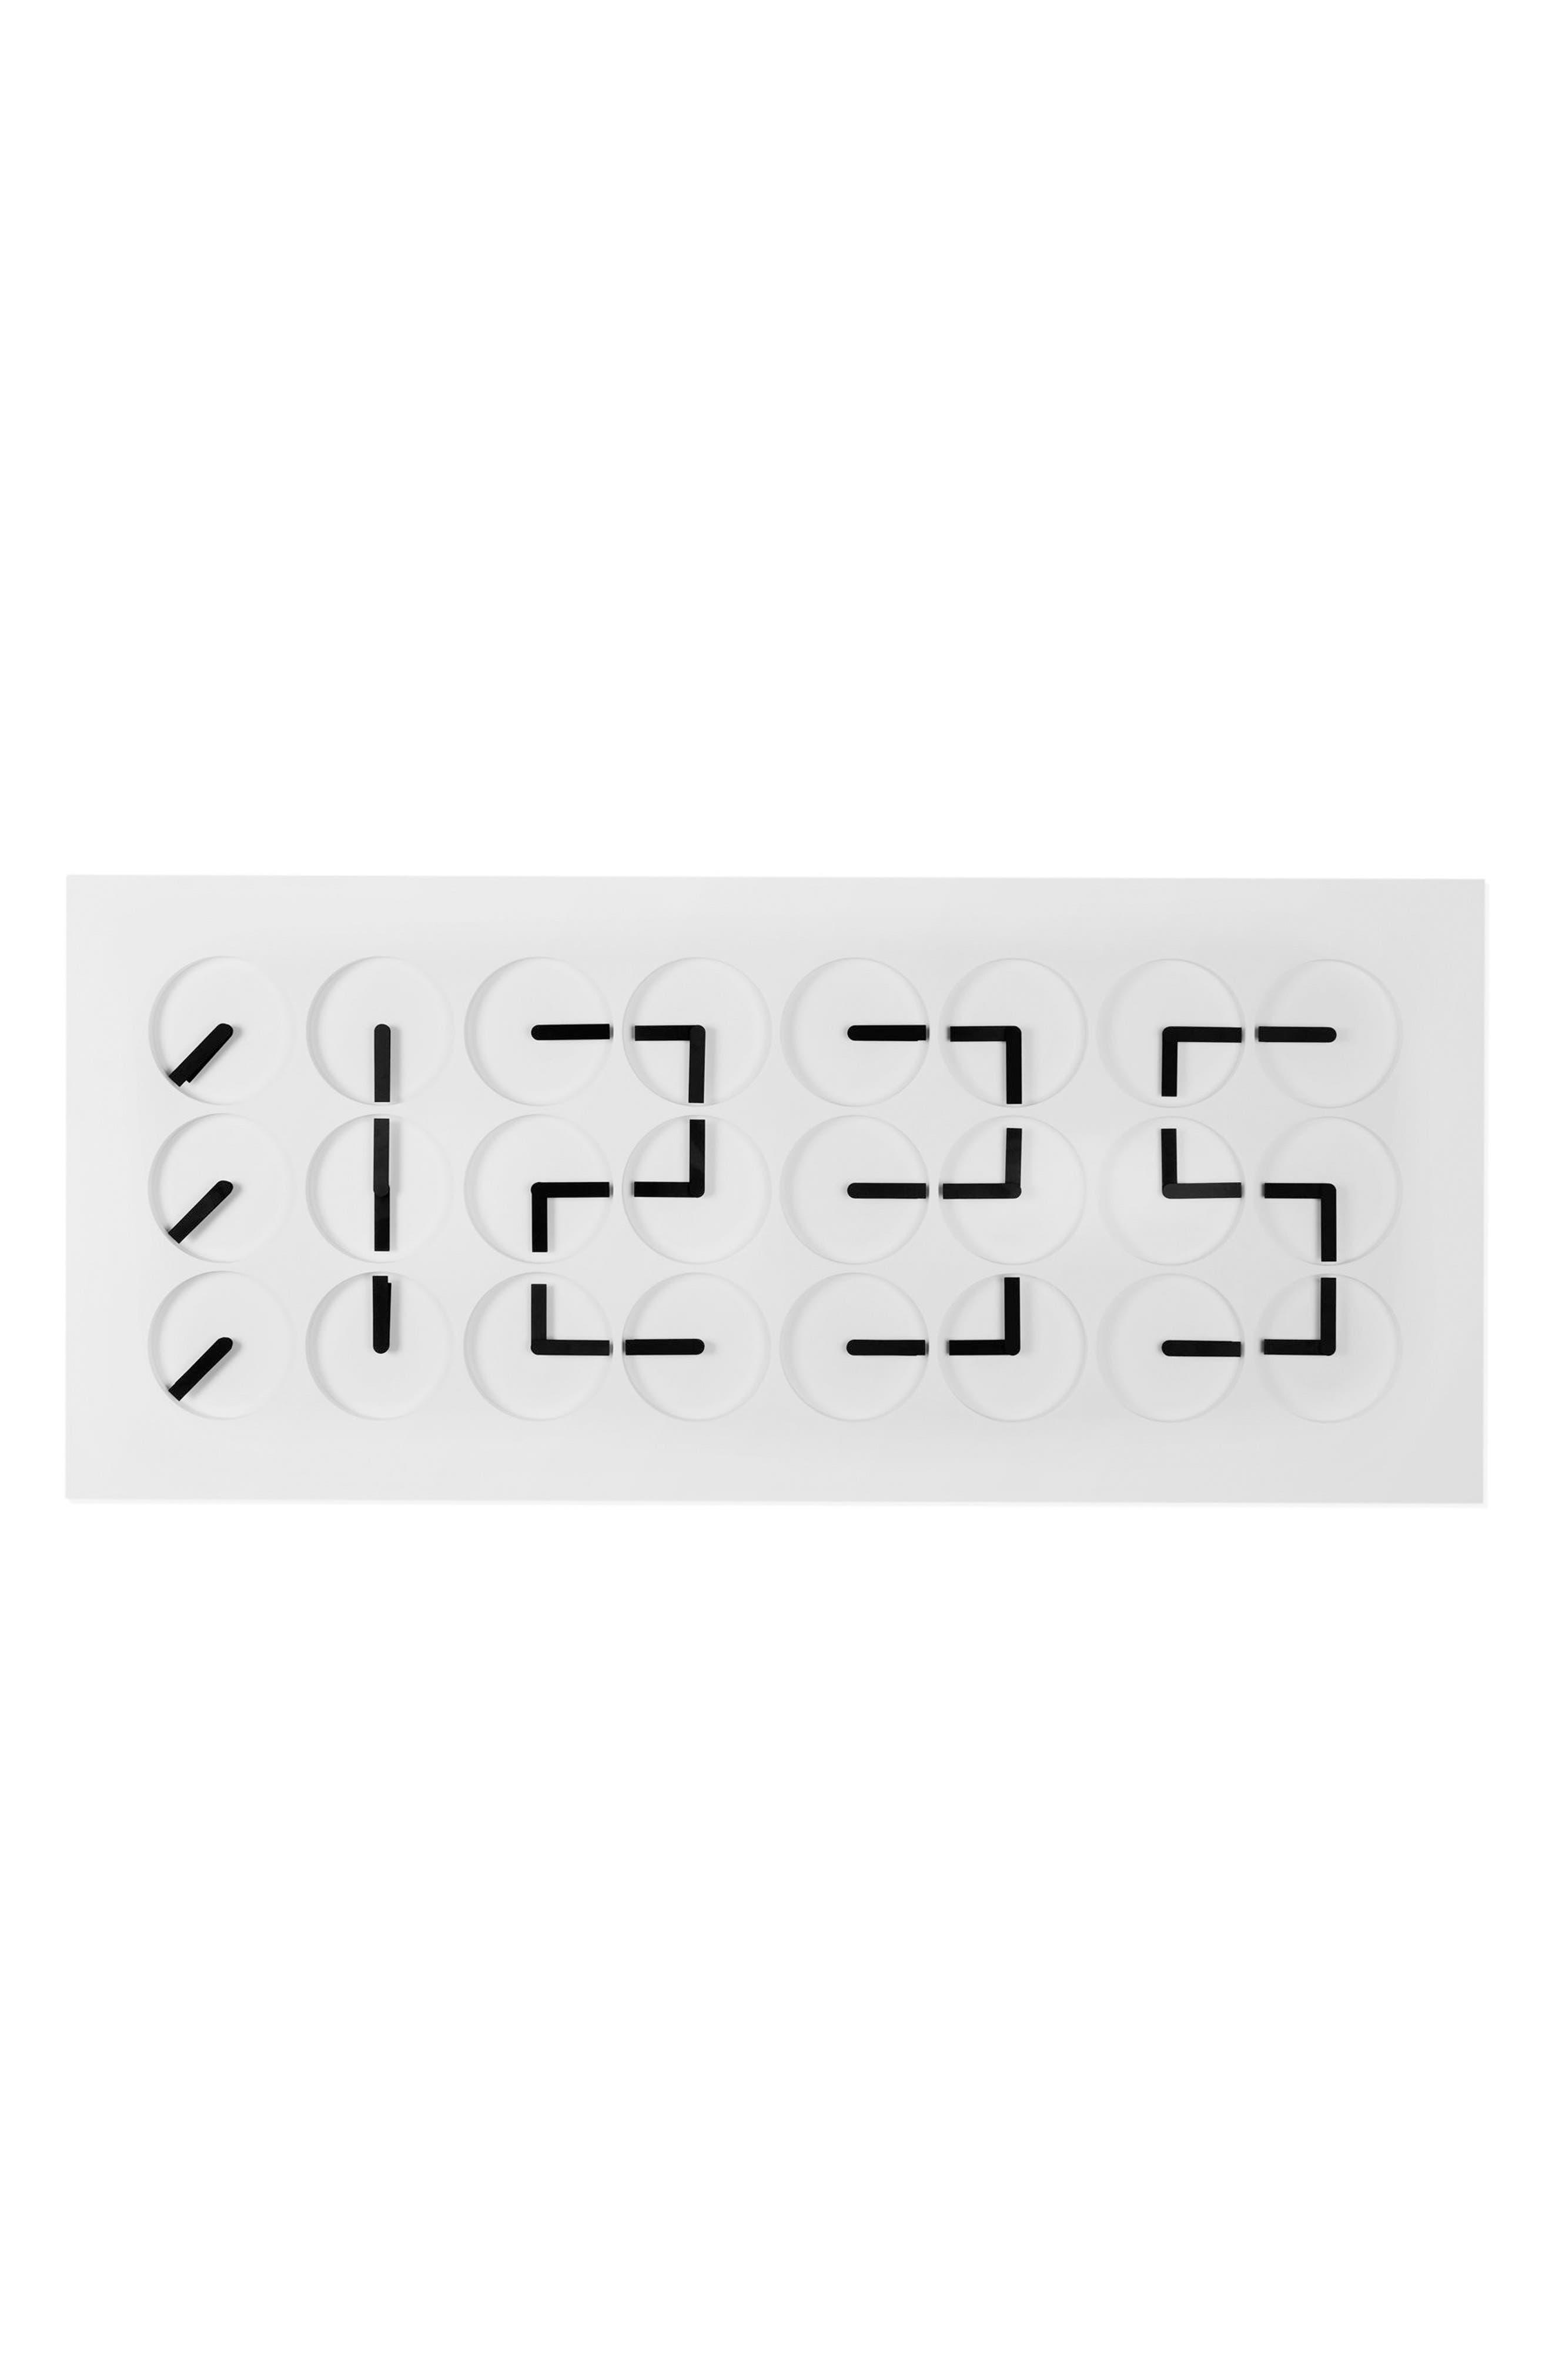 Main Image - MoMA Design Store ClockClock 24 Digital Clock